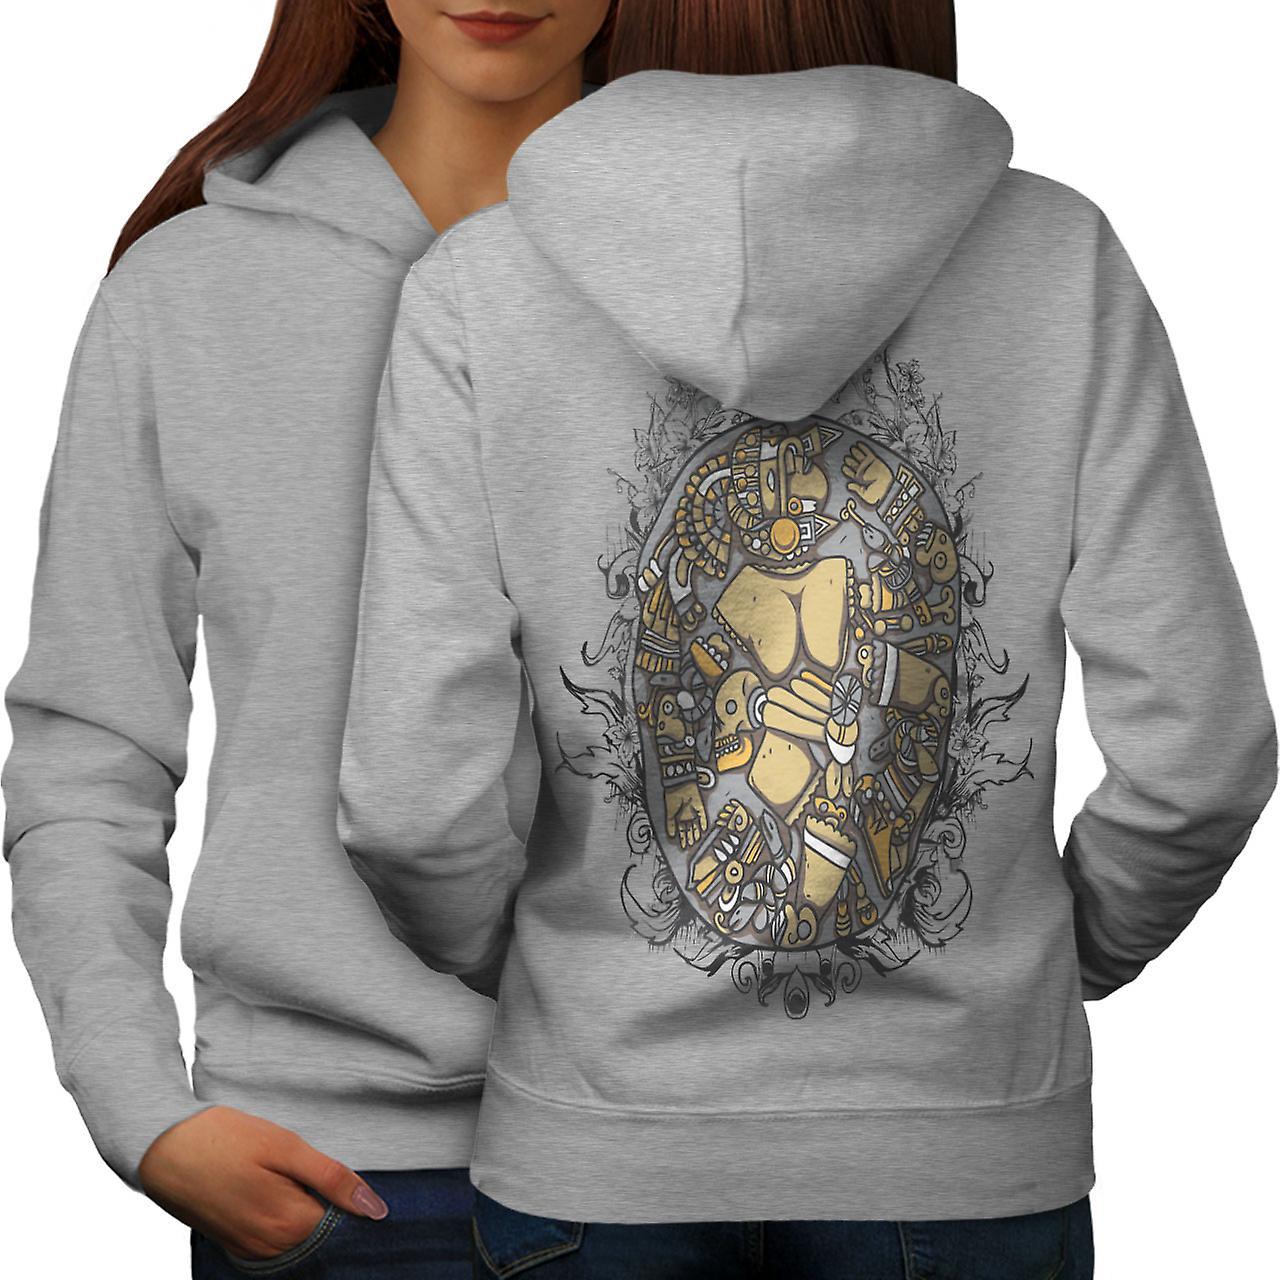 Mosaic fashion online shop 55